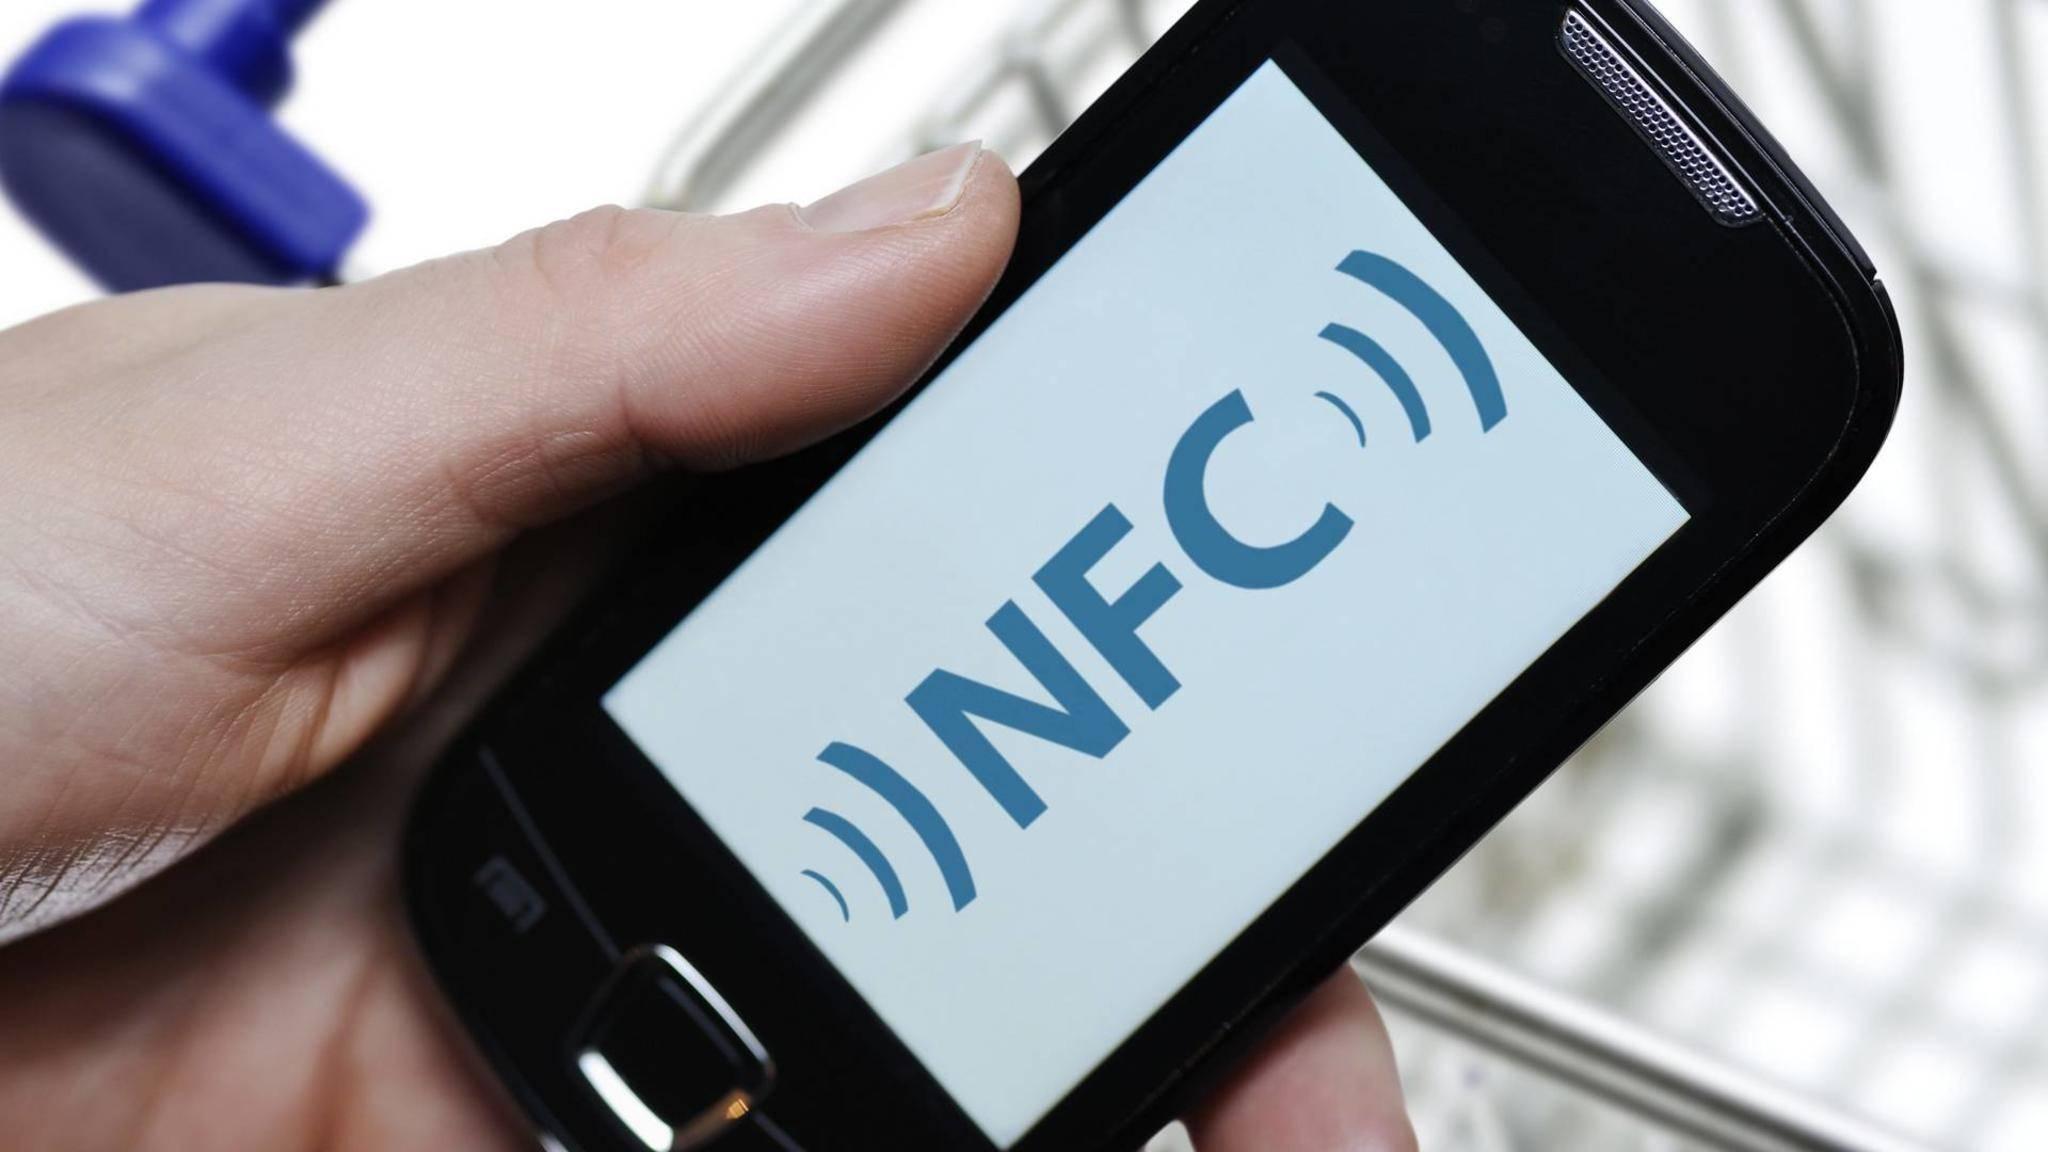 Kontakte Und Digitale Visitenkarten Per Nfc Teilen So Geht S